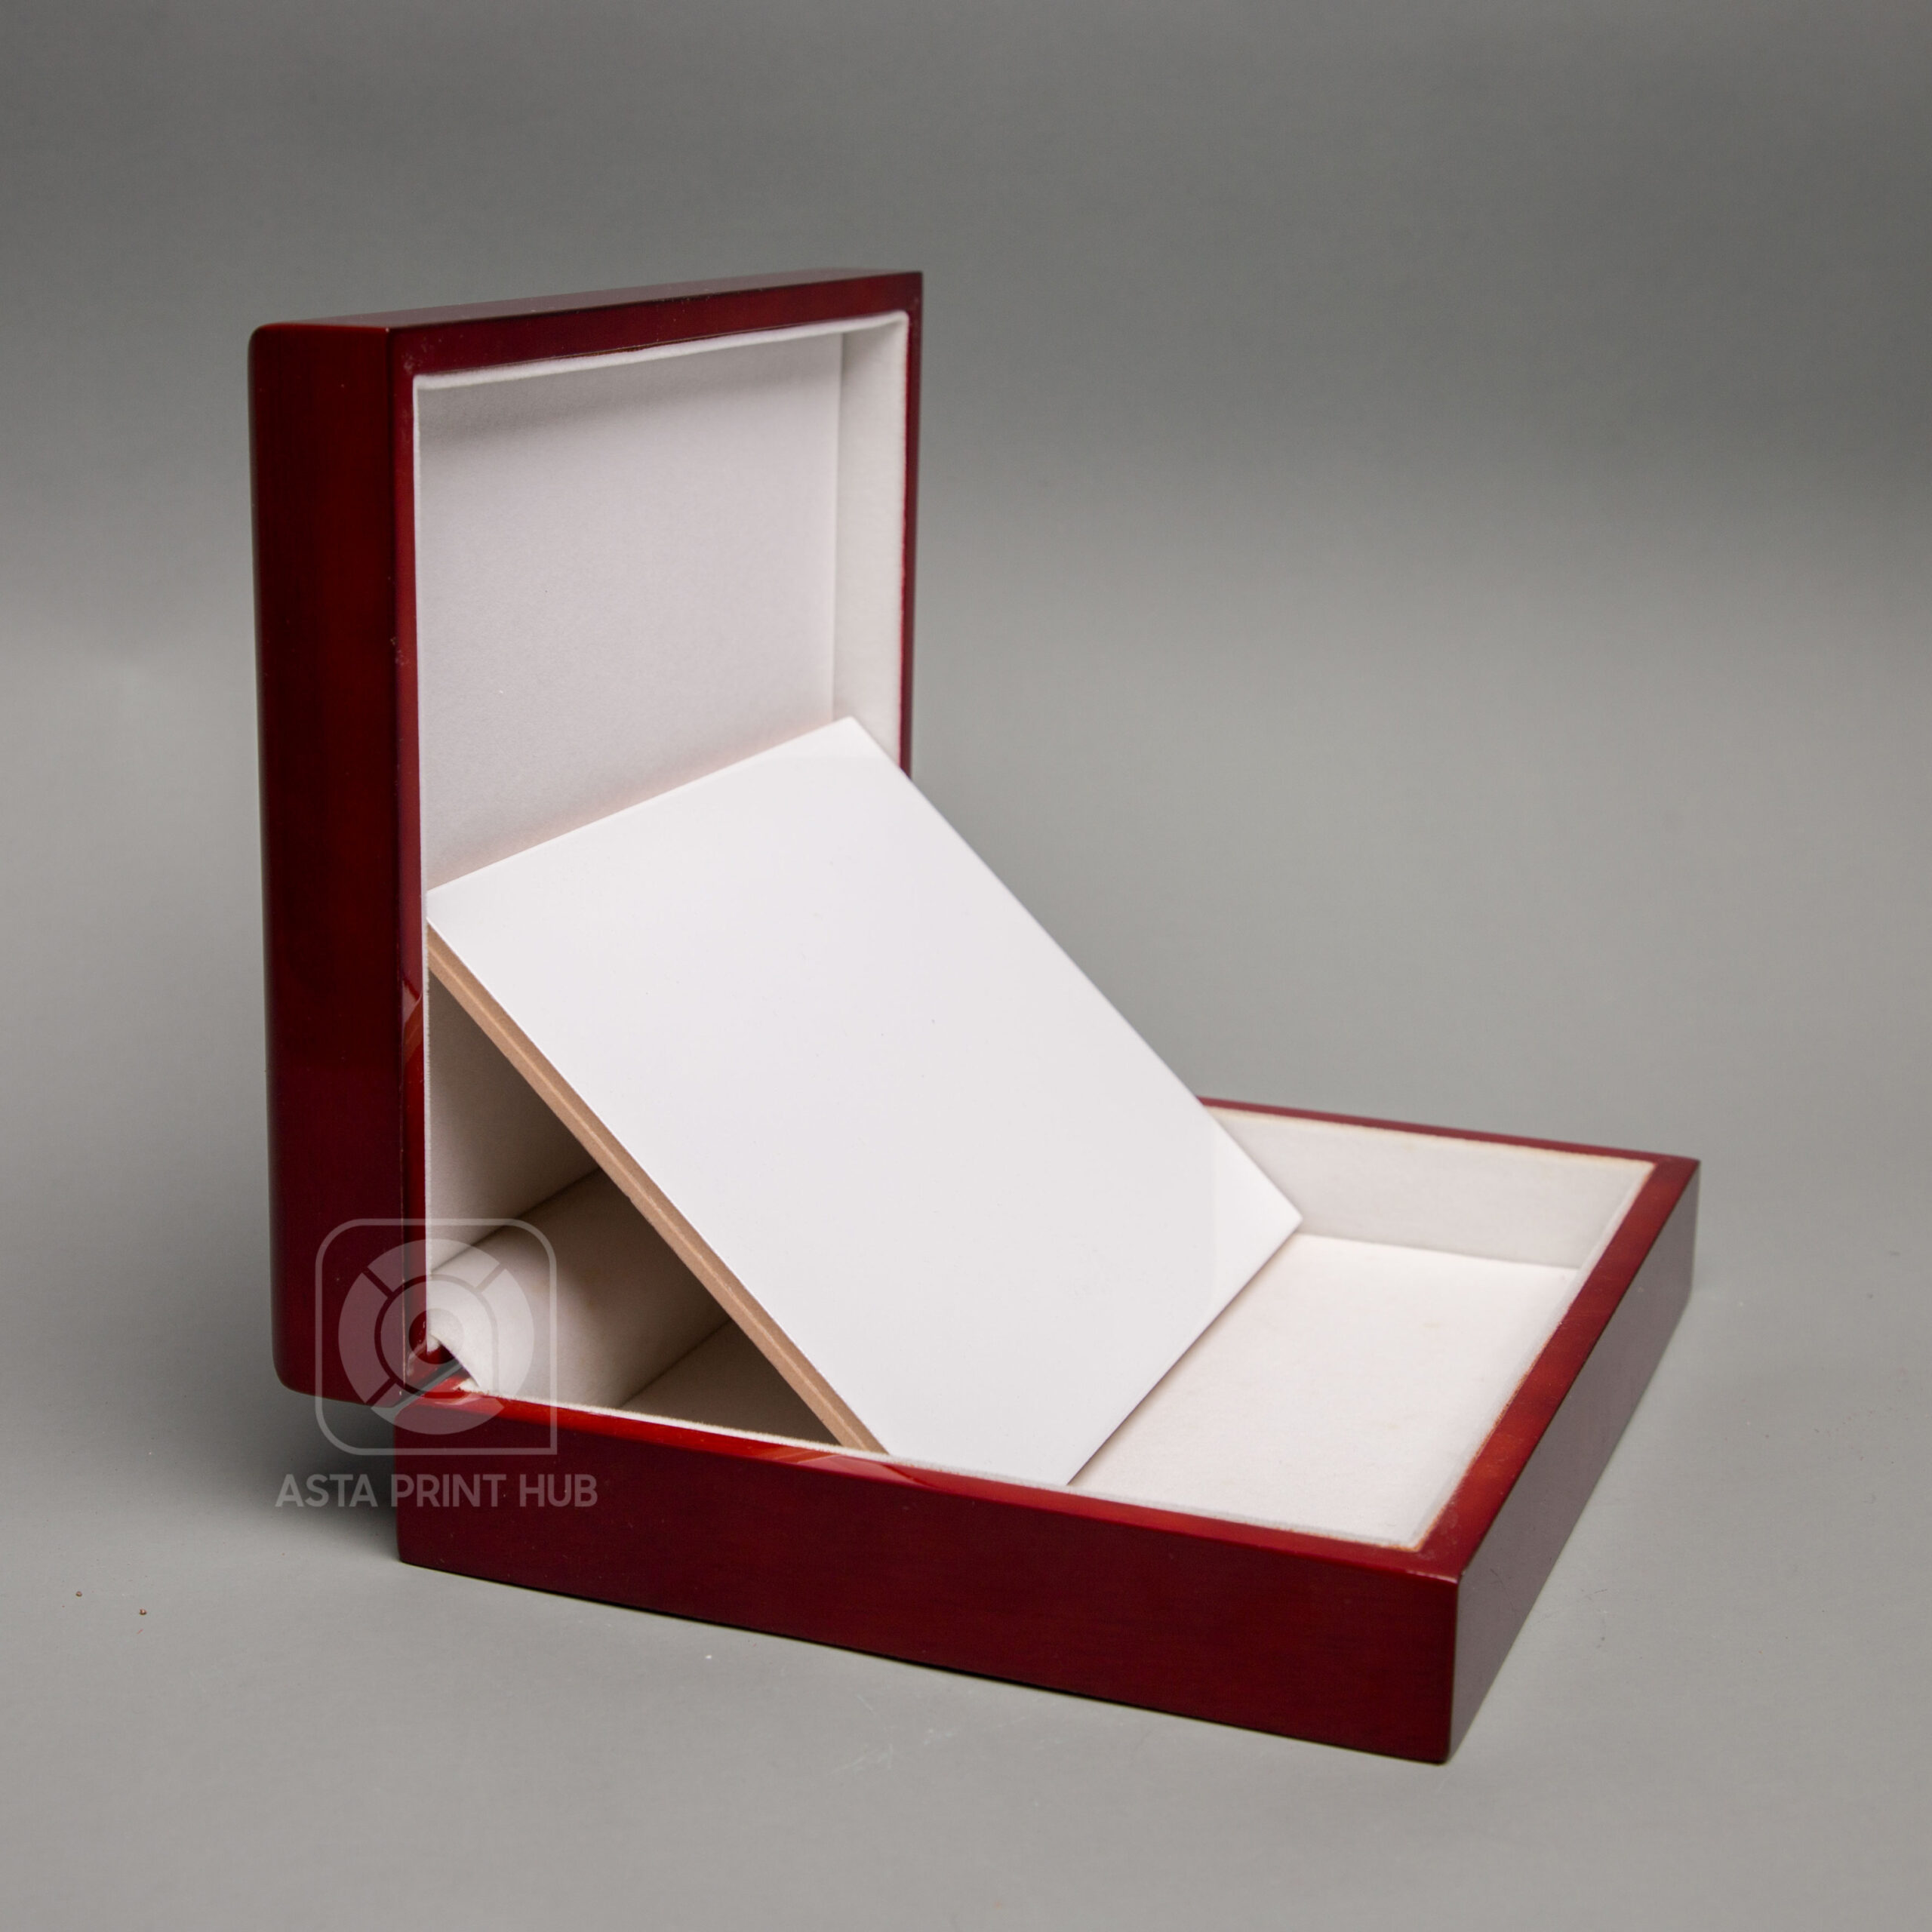 astaprinthub-items-9786756 (27)